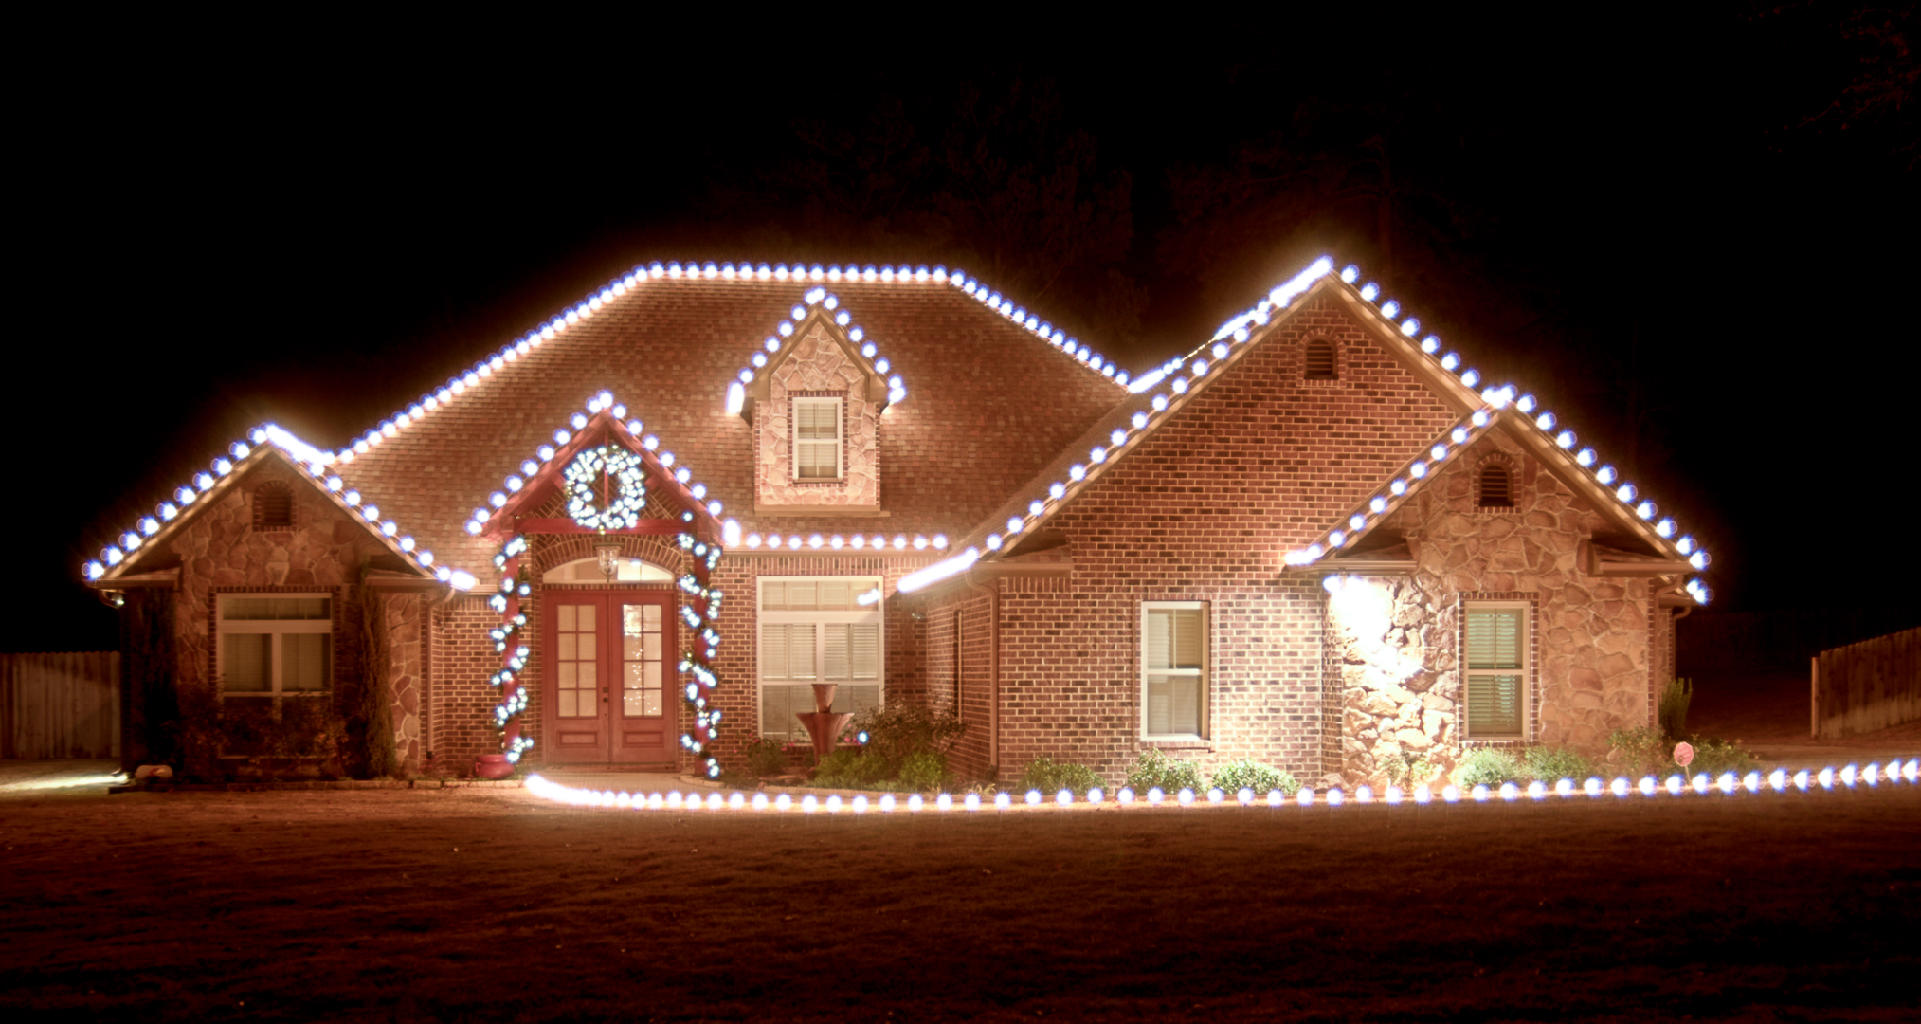 christmas light installation dallas fortworth burleson tx 76028 ypcom - Christmas Light Houses